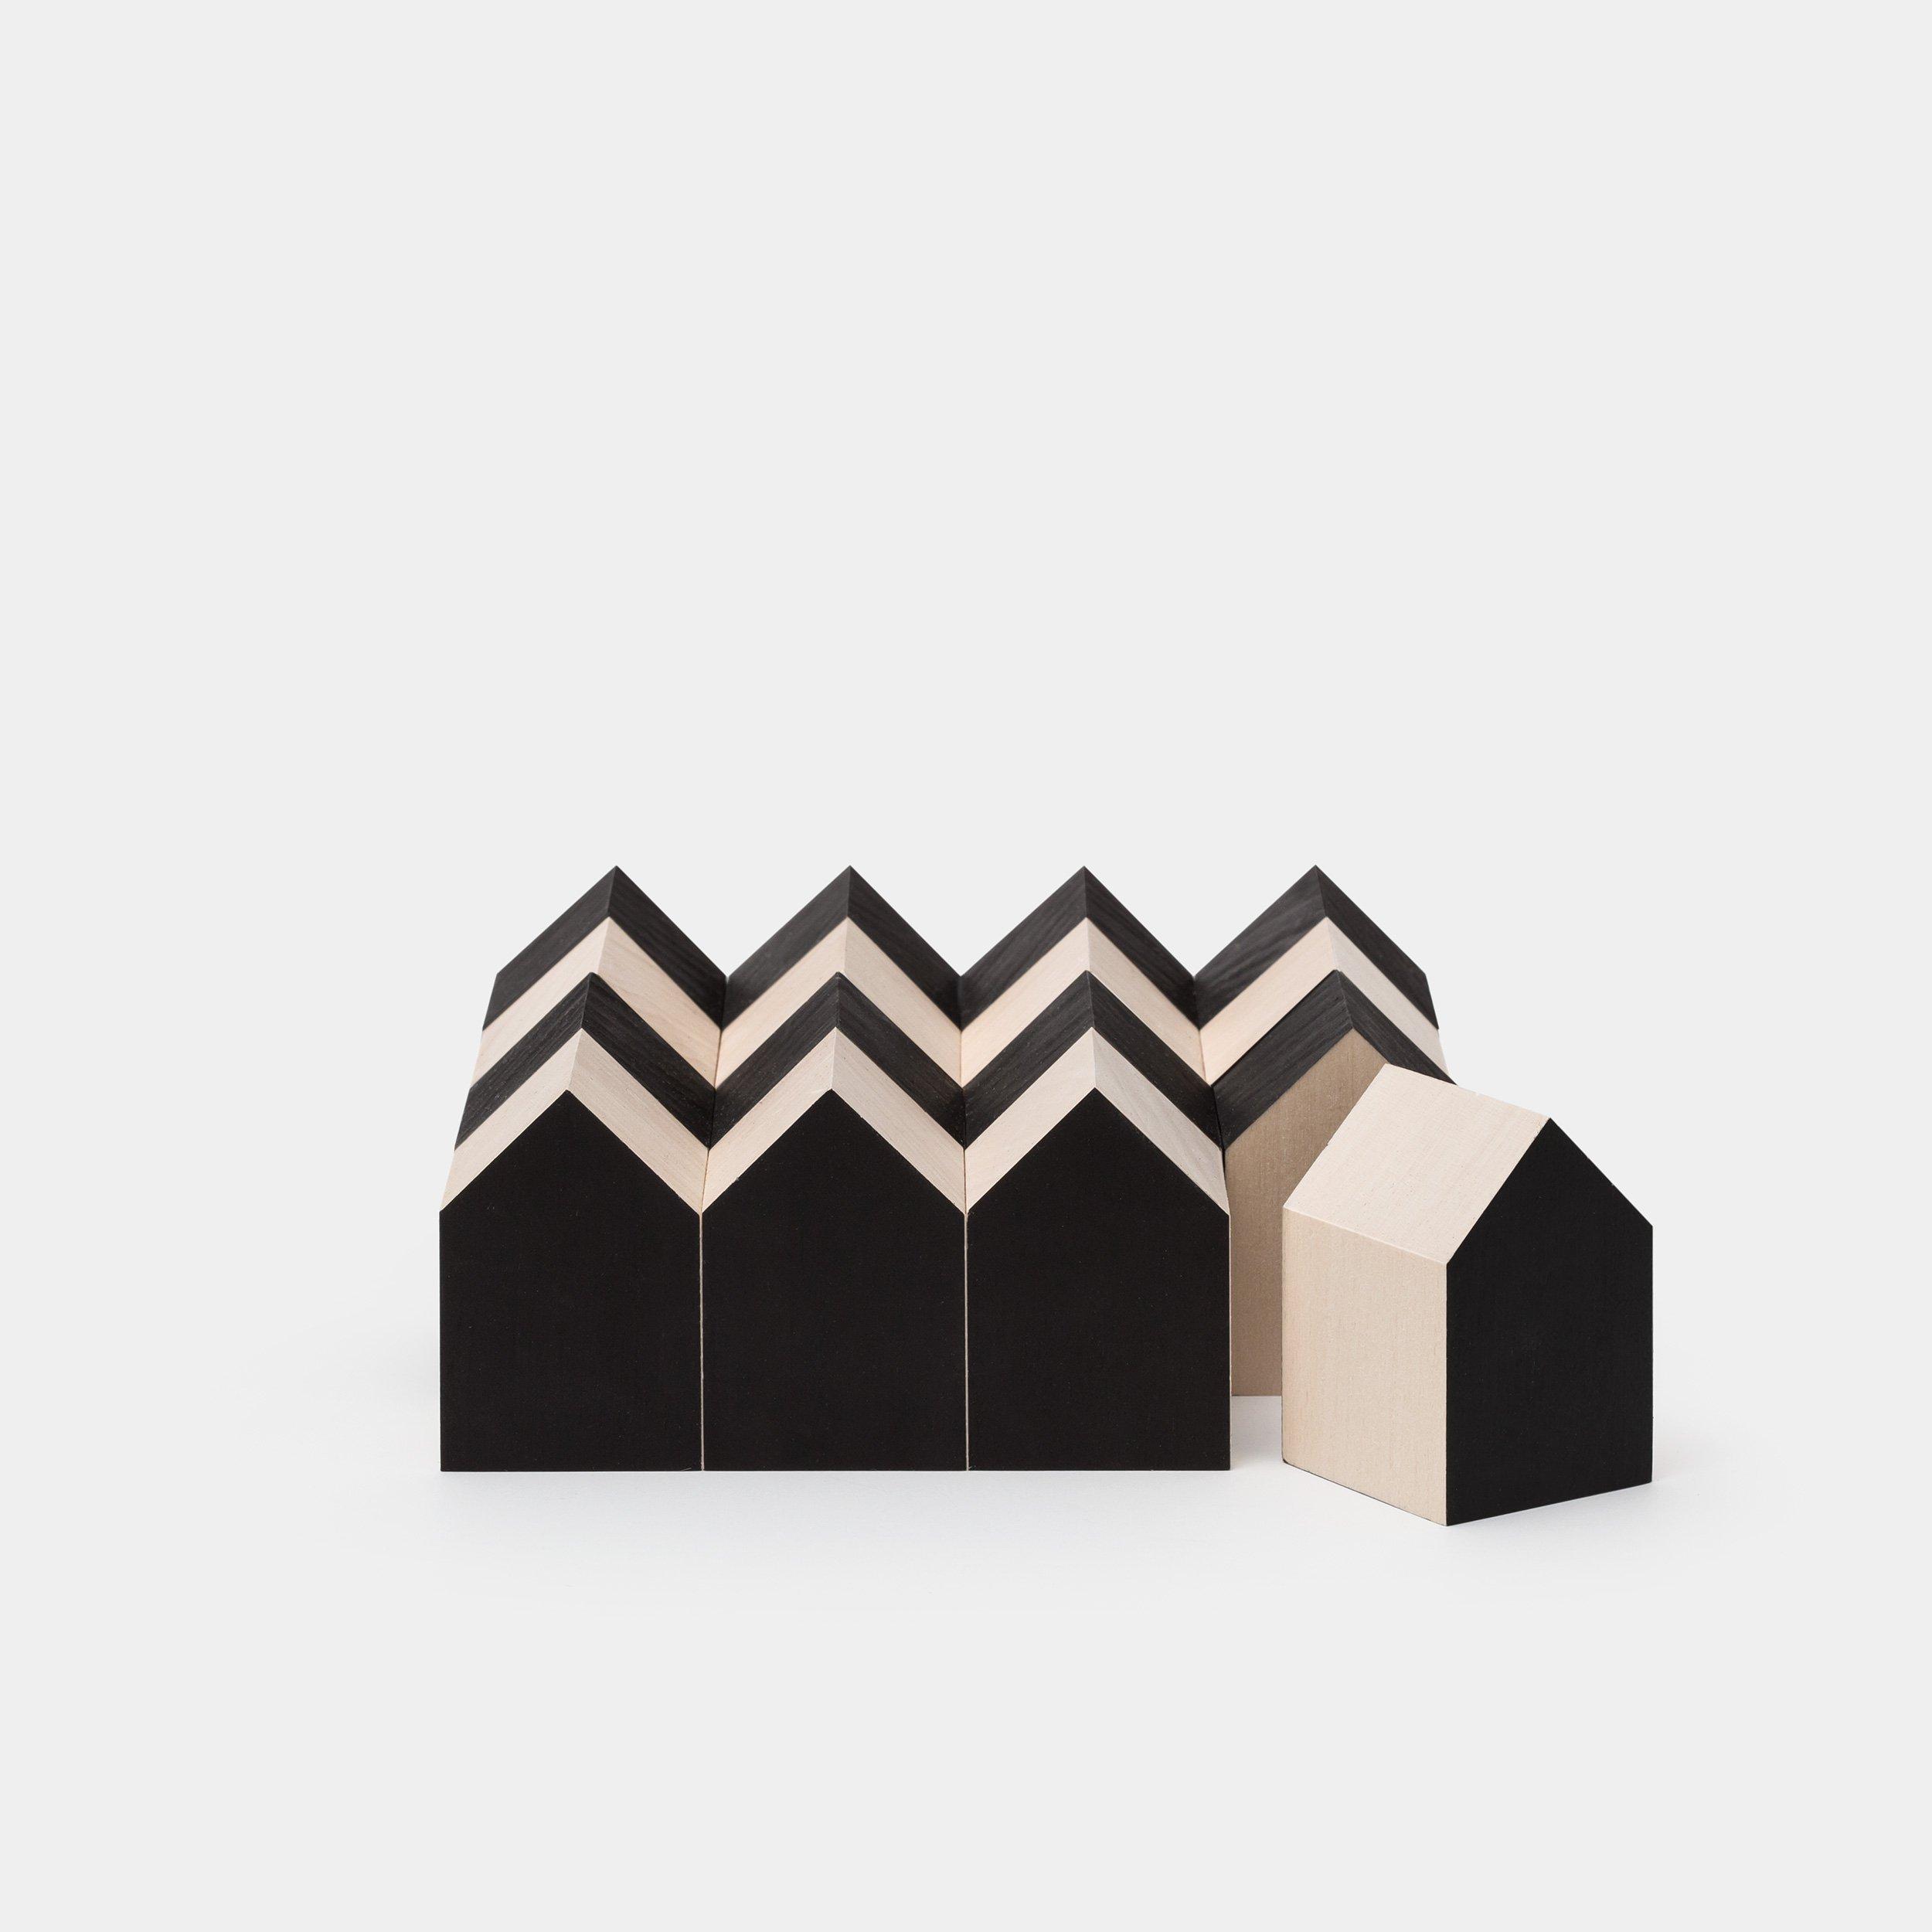 archiblocks-house-black_2500x